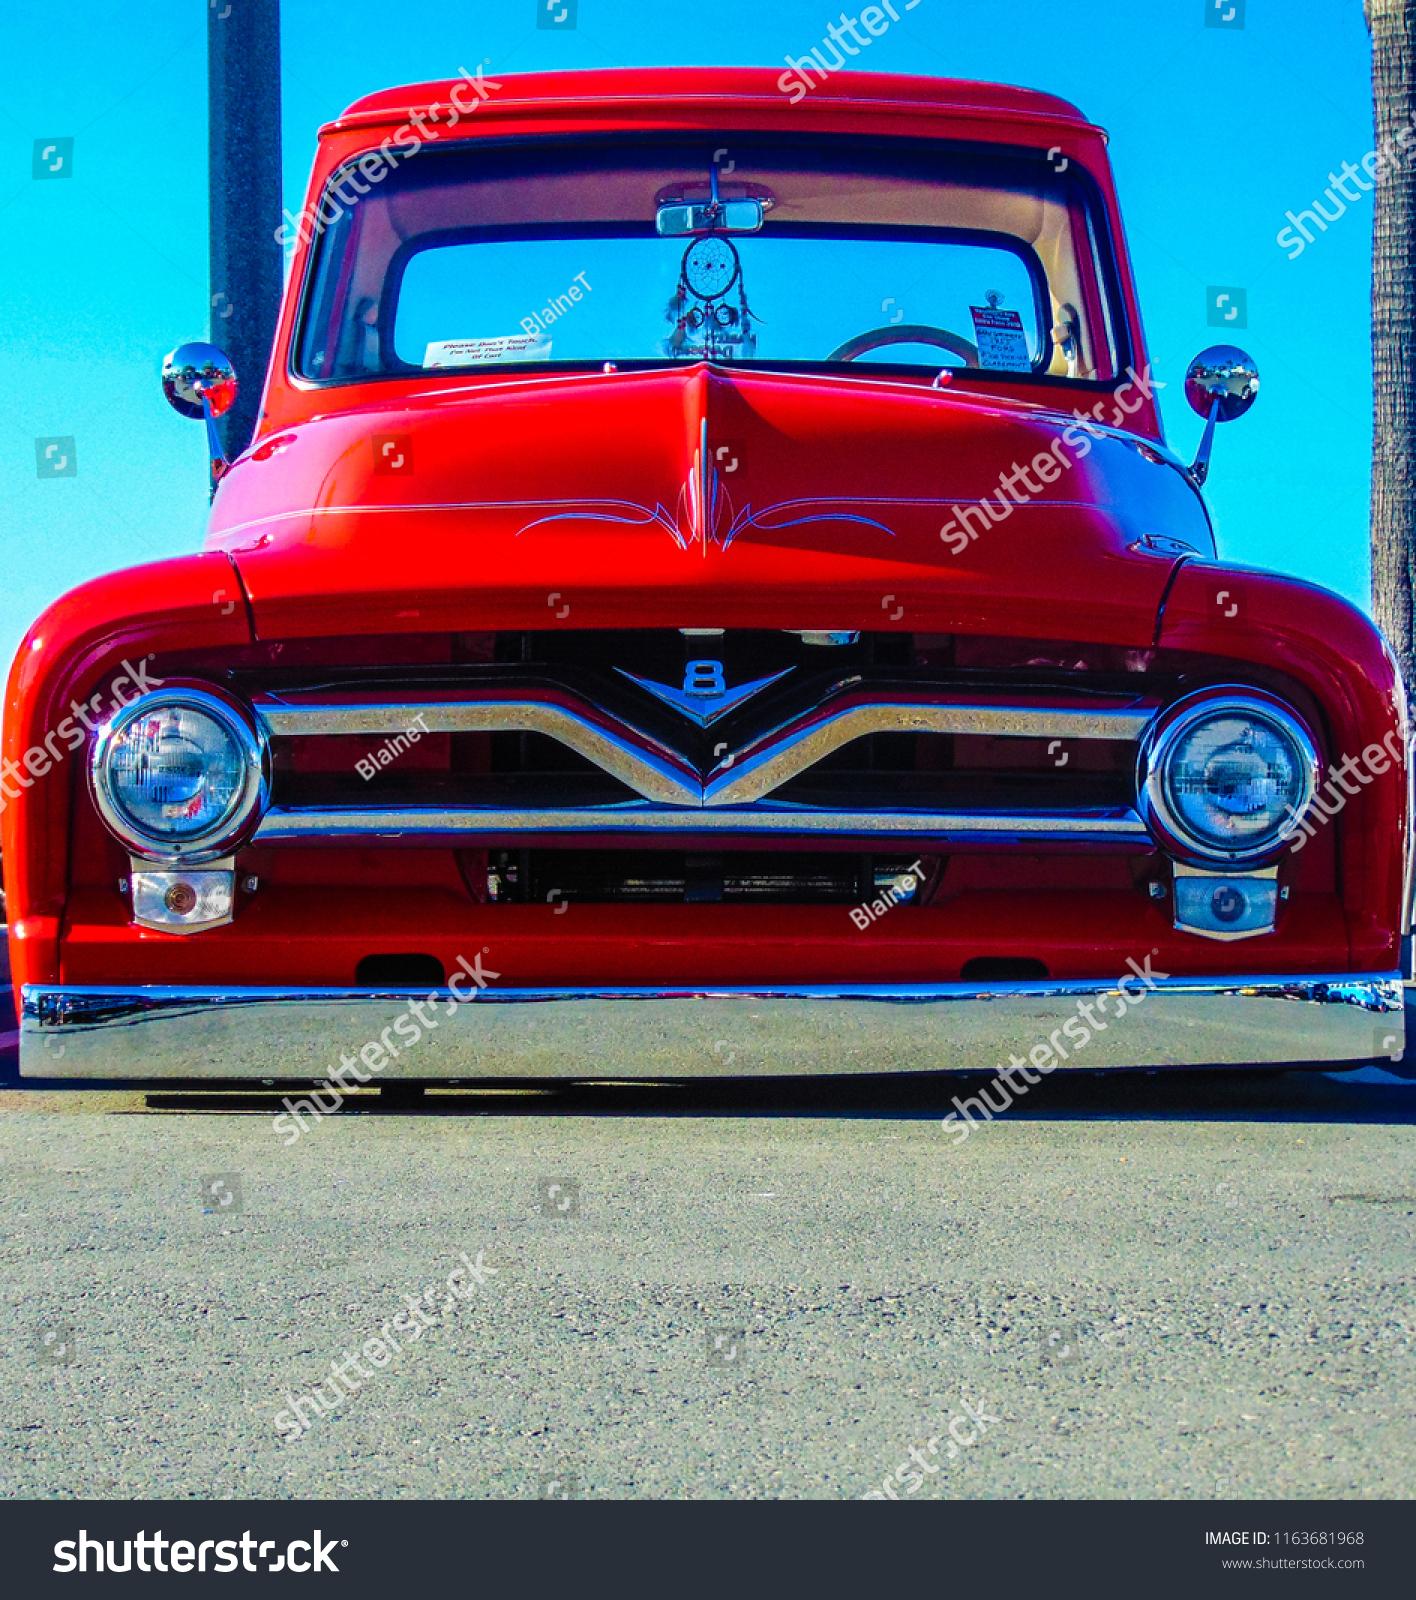 Huntington Beach Ca Usa November 11 Stock Photo Edit Now 1955 Ford F100 Hood 2016 Frontal View Of A